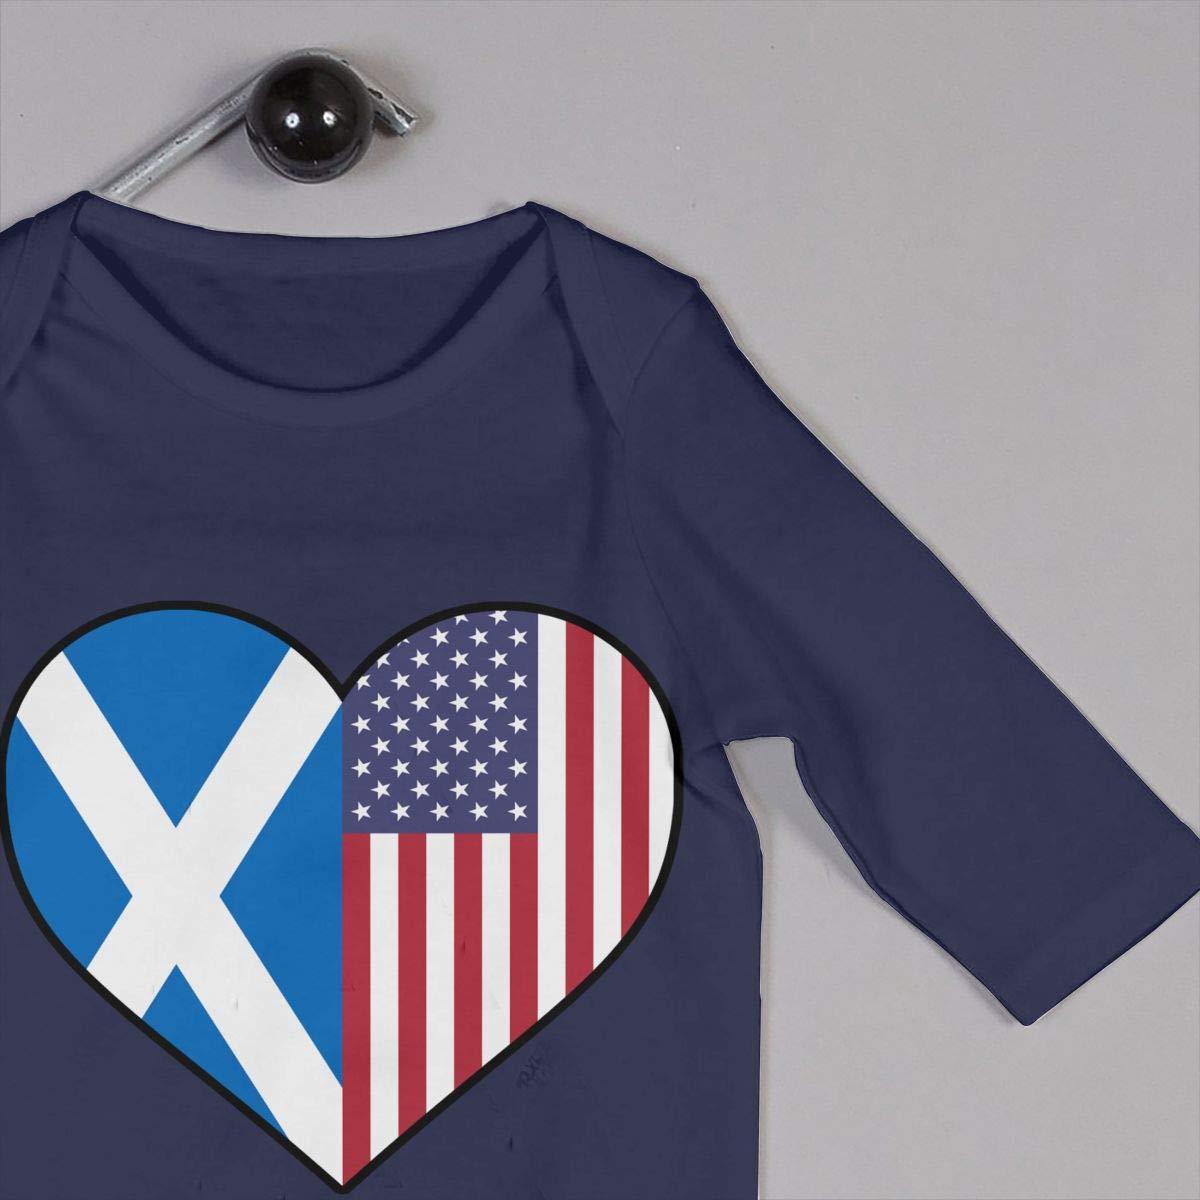 LBJQ8 Scotland Flag Half America Flag Half Heart Shaped Unisex Baby Organic Cotton Jumpsuit Overall Romper